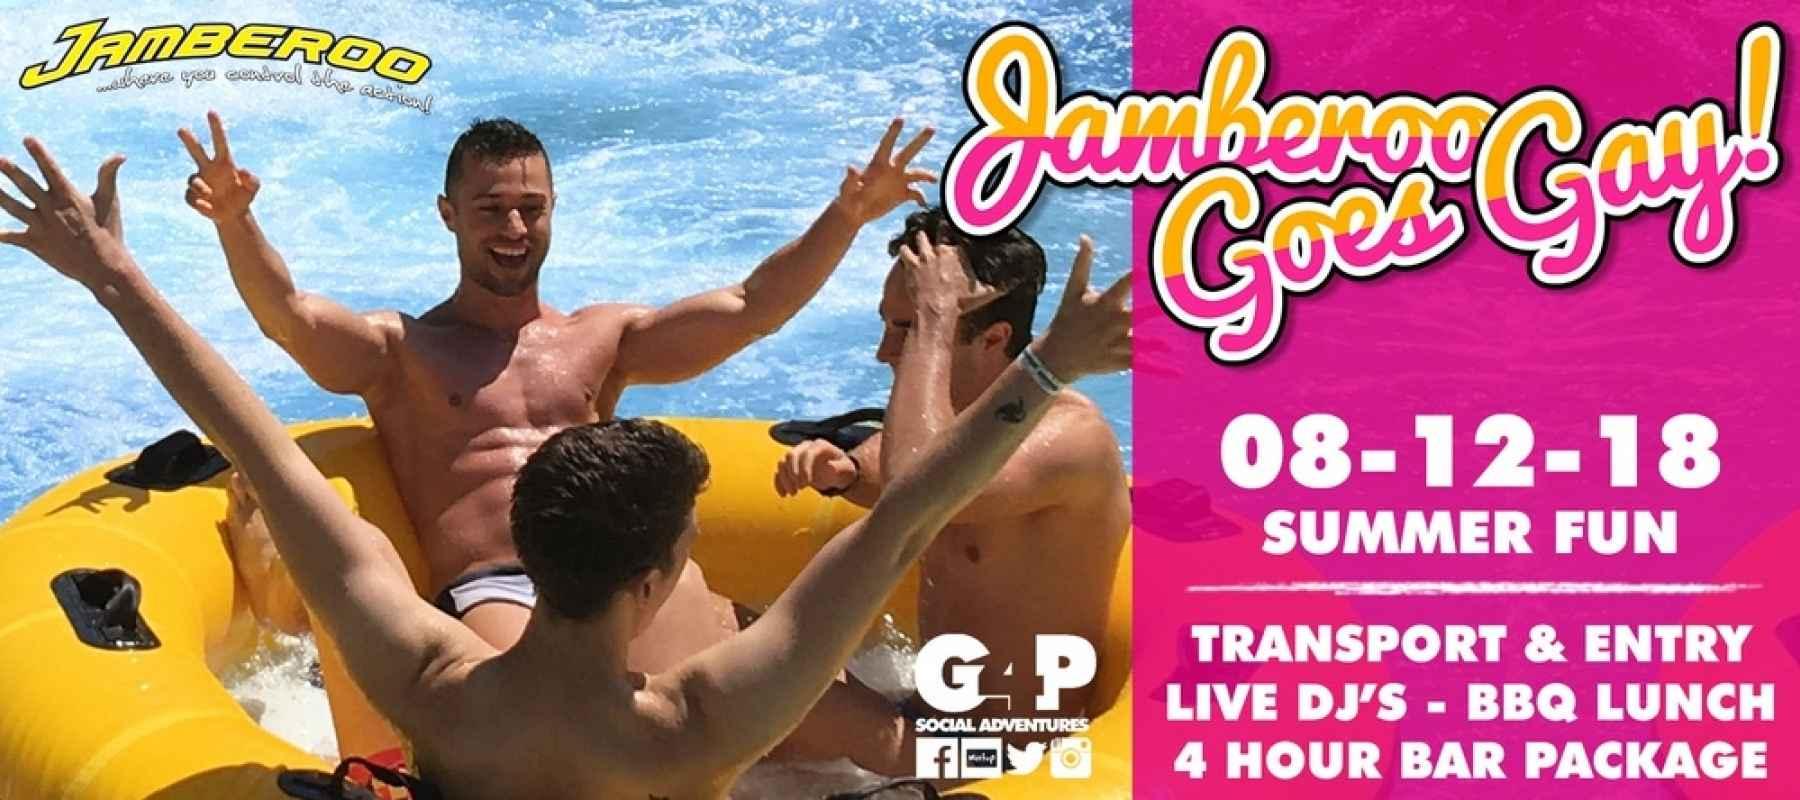 Jamberoo Goes Gay 2018